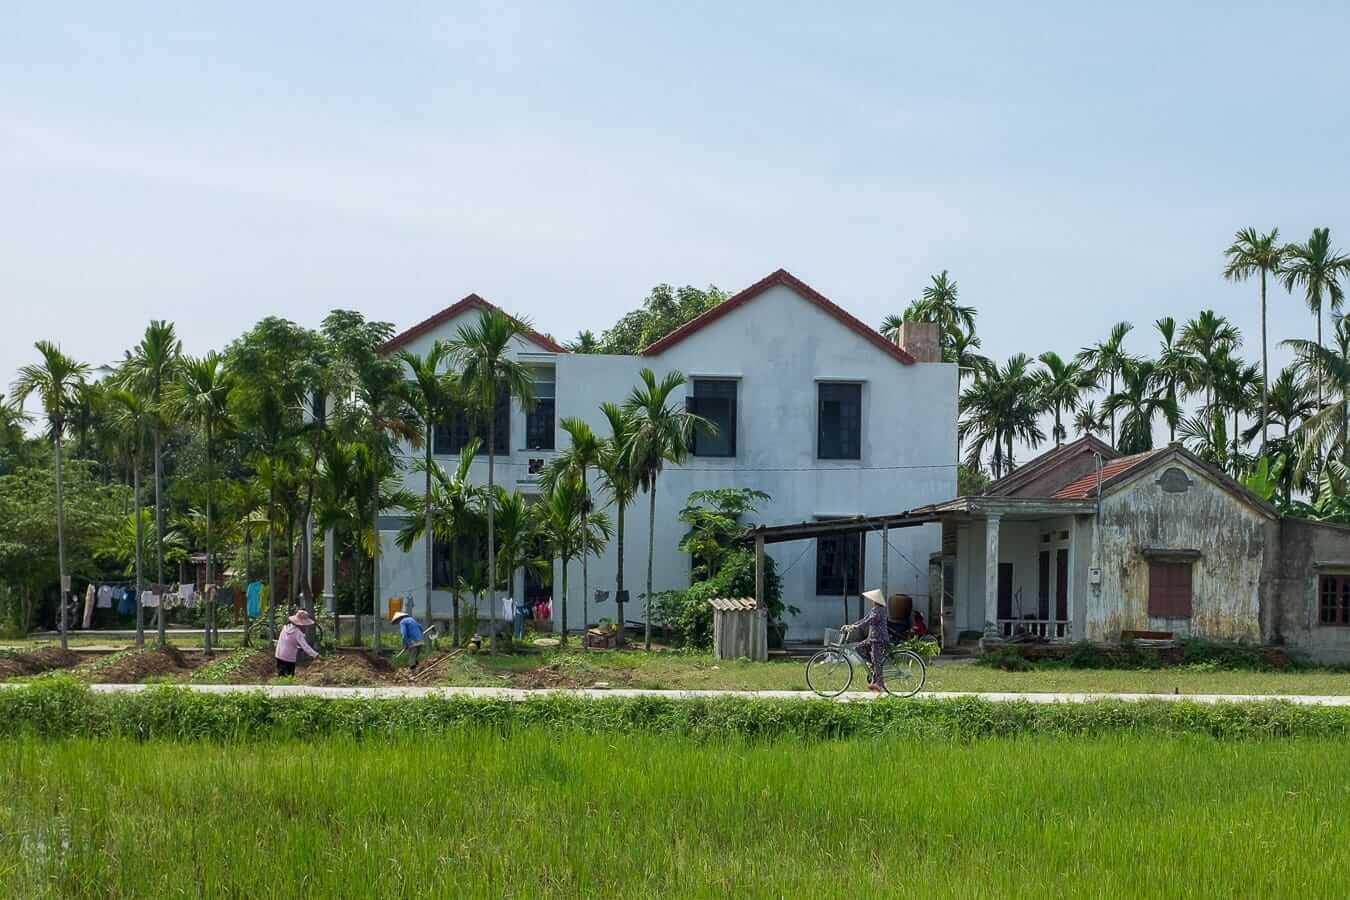 Rice paddies: Hoi An cycling